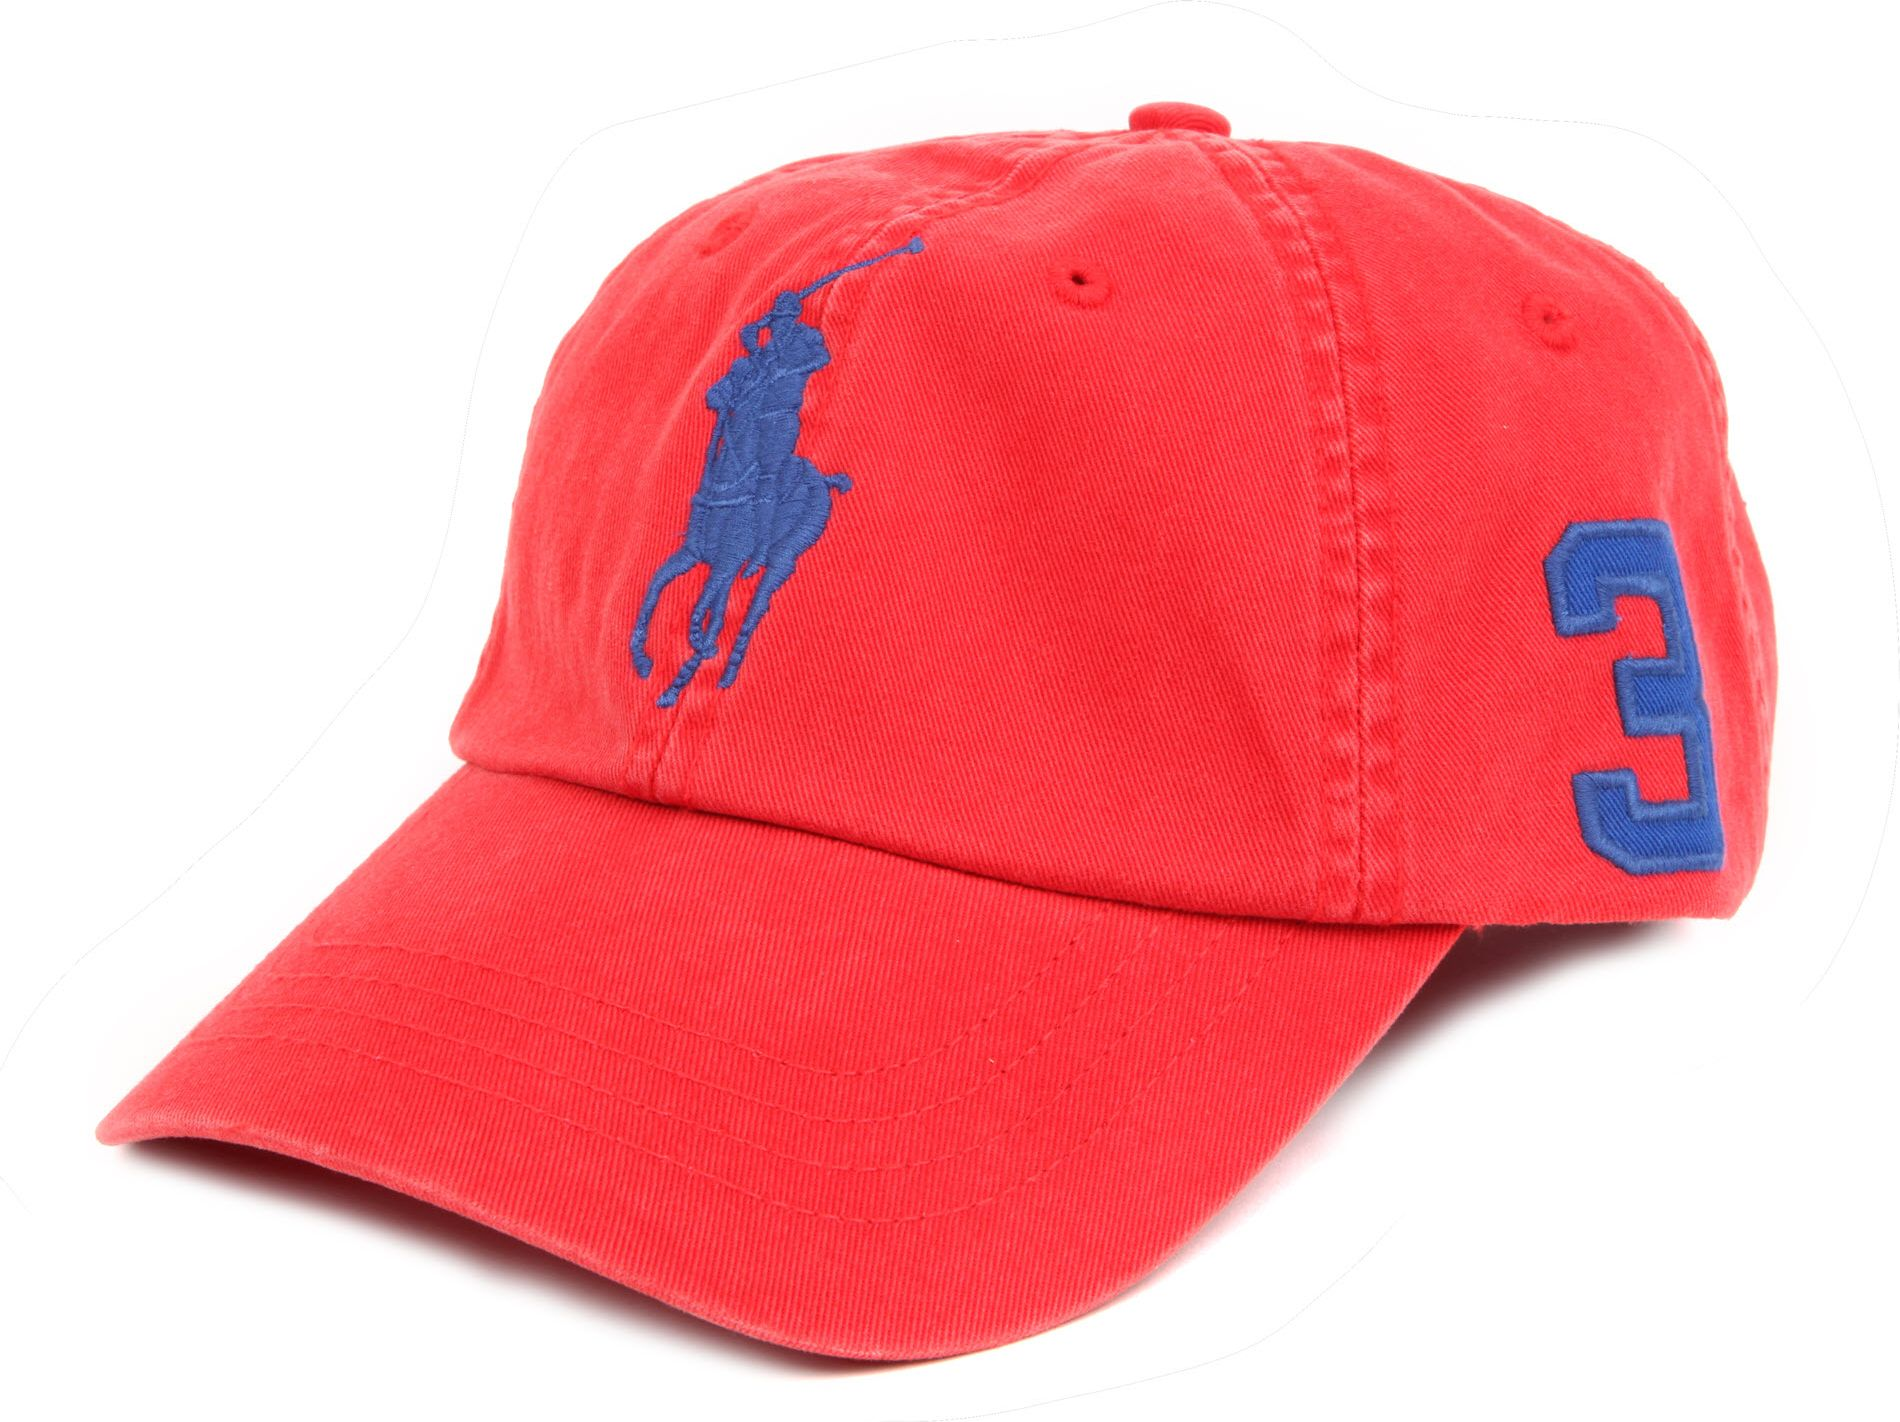 ralph lauren big pony baseball cap in red for men lyst. Black Bedroom Furniture Sets. Home Design Ideas